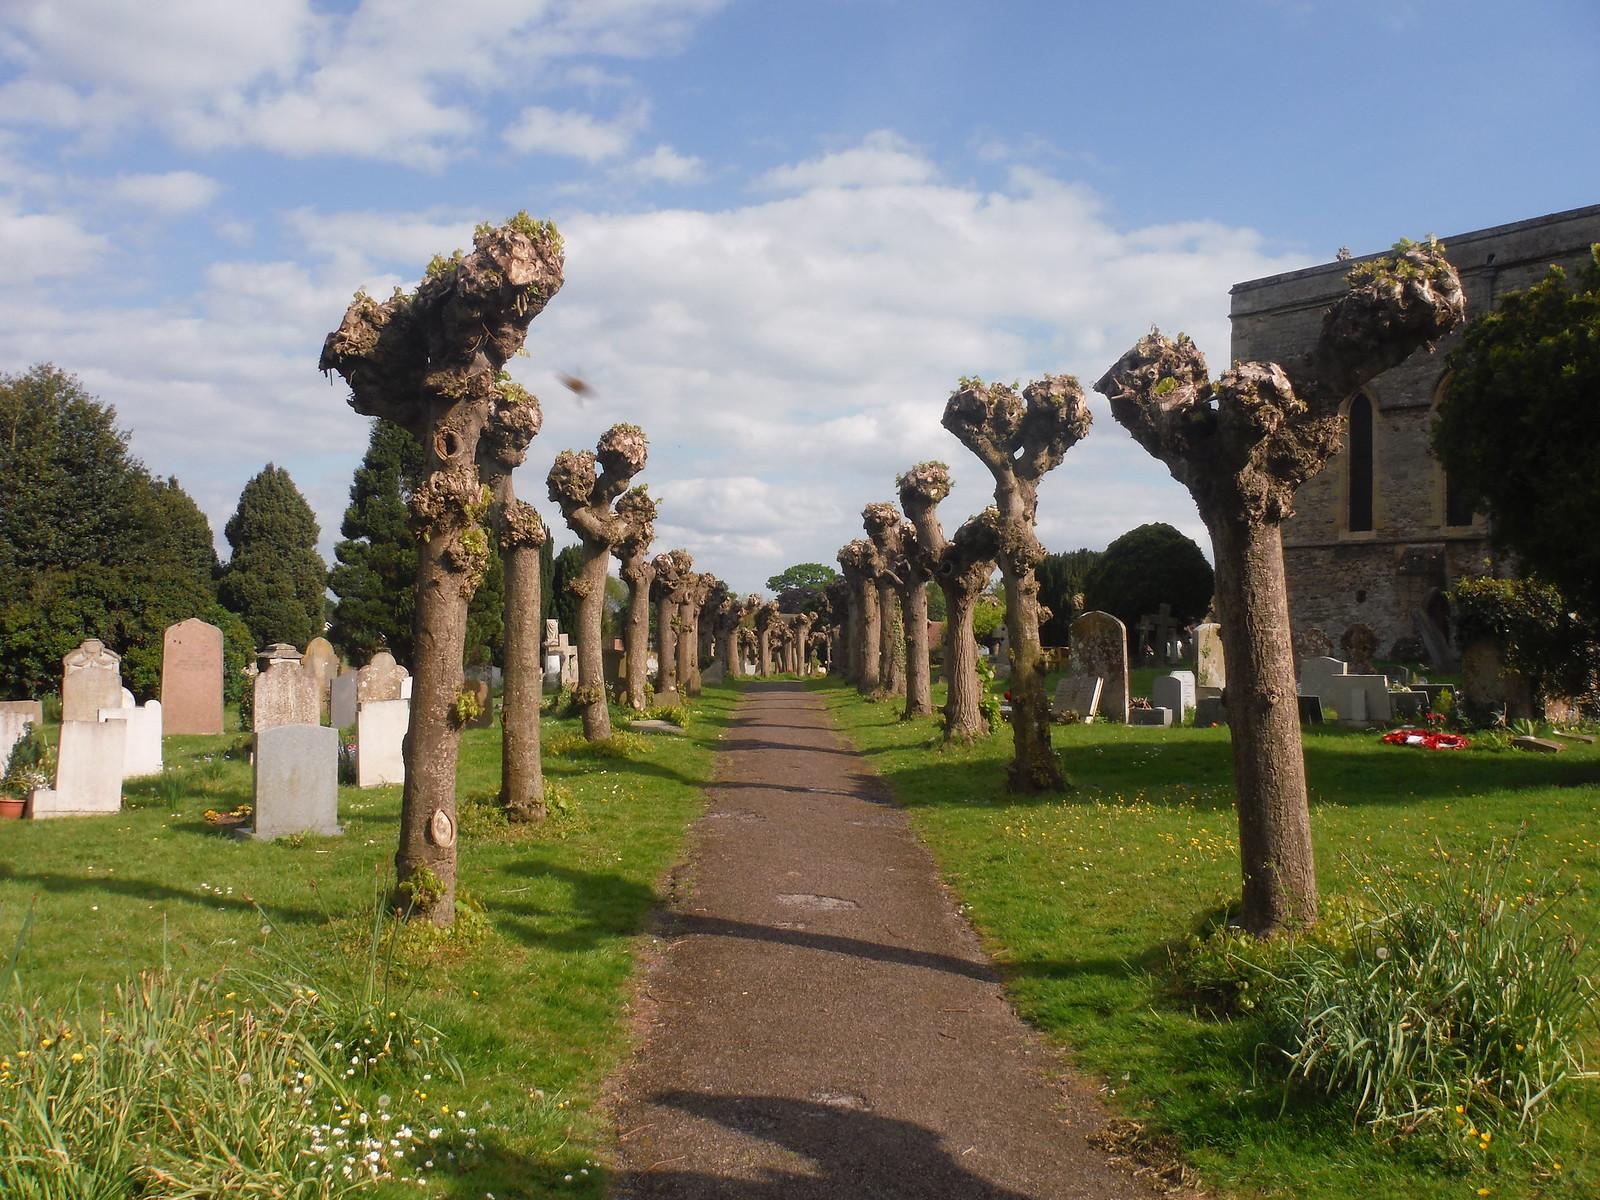 Churchyard of St. Mary the Virgin, Thame SWC Walk 190 - Thame Circular